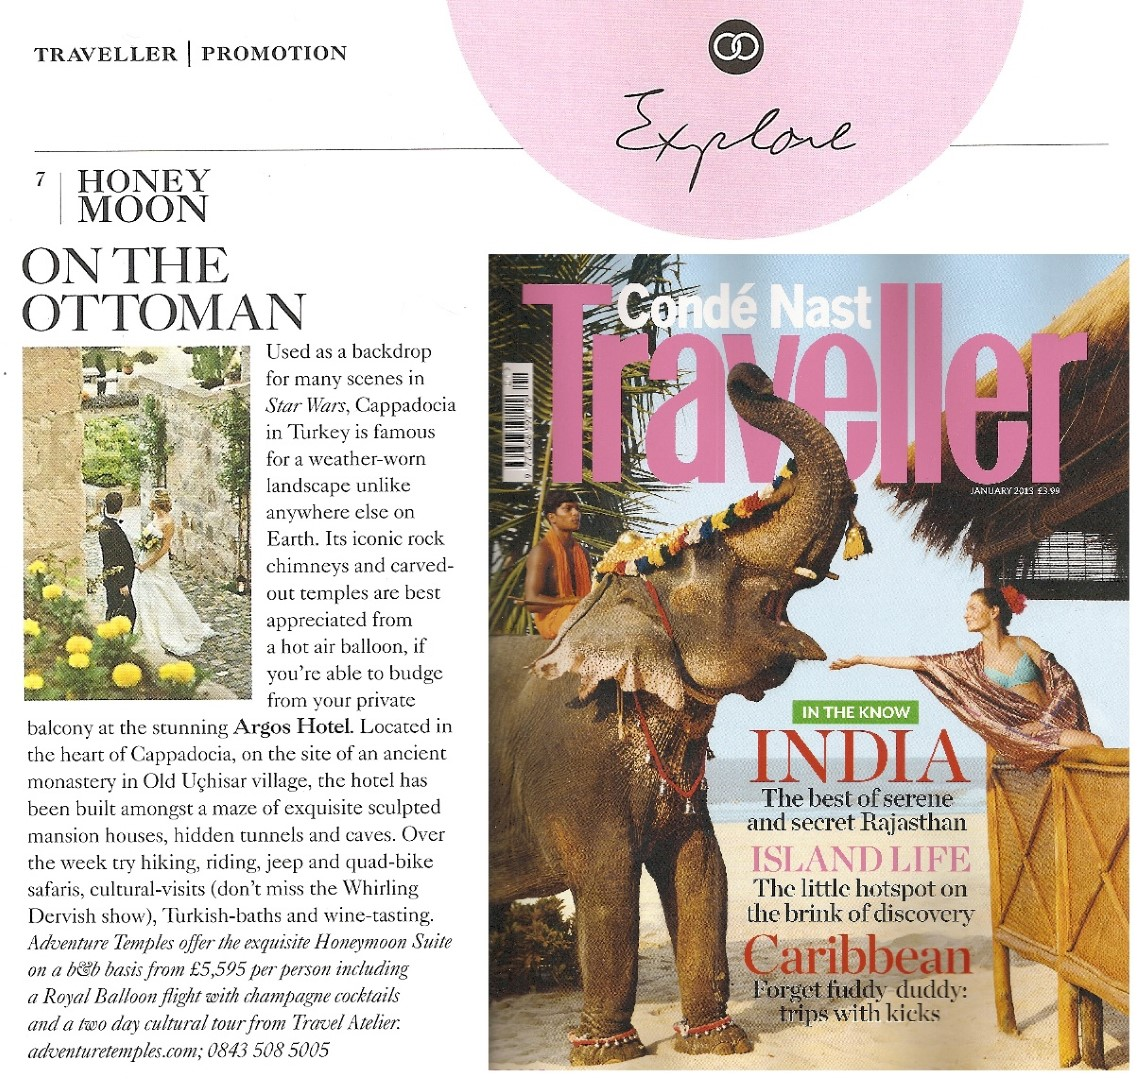 conde-nast-traveler-honeymoon-ottoman